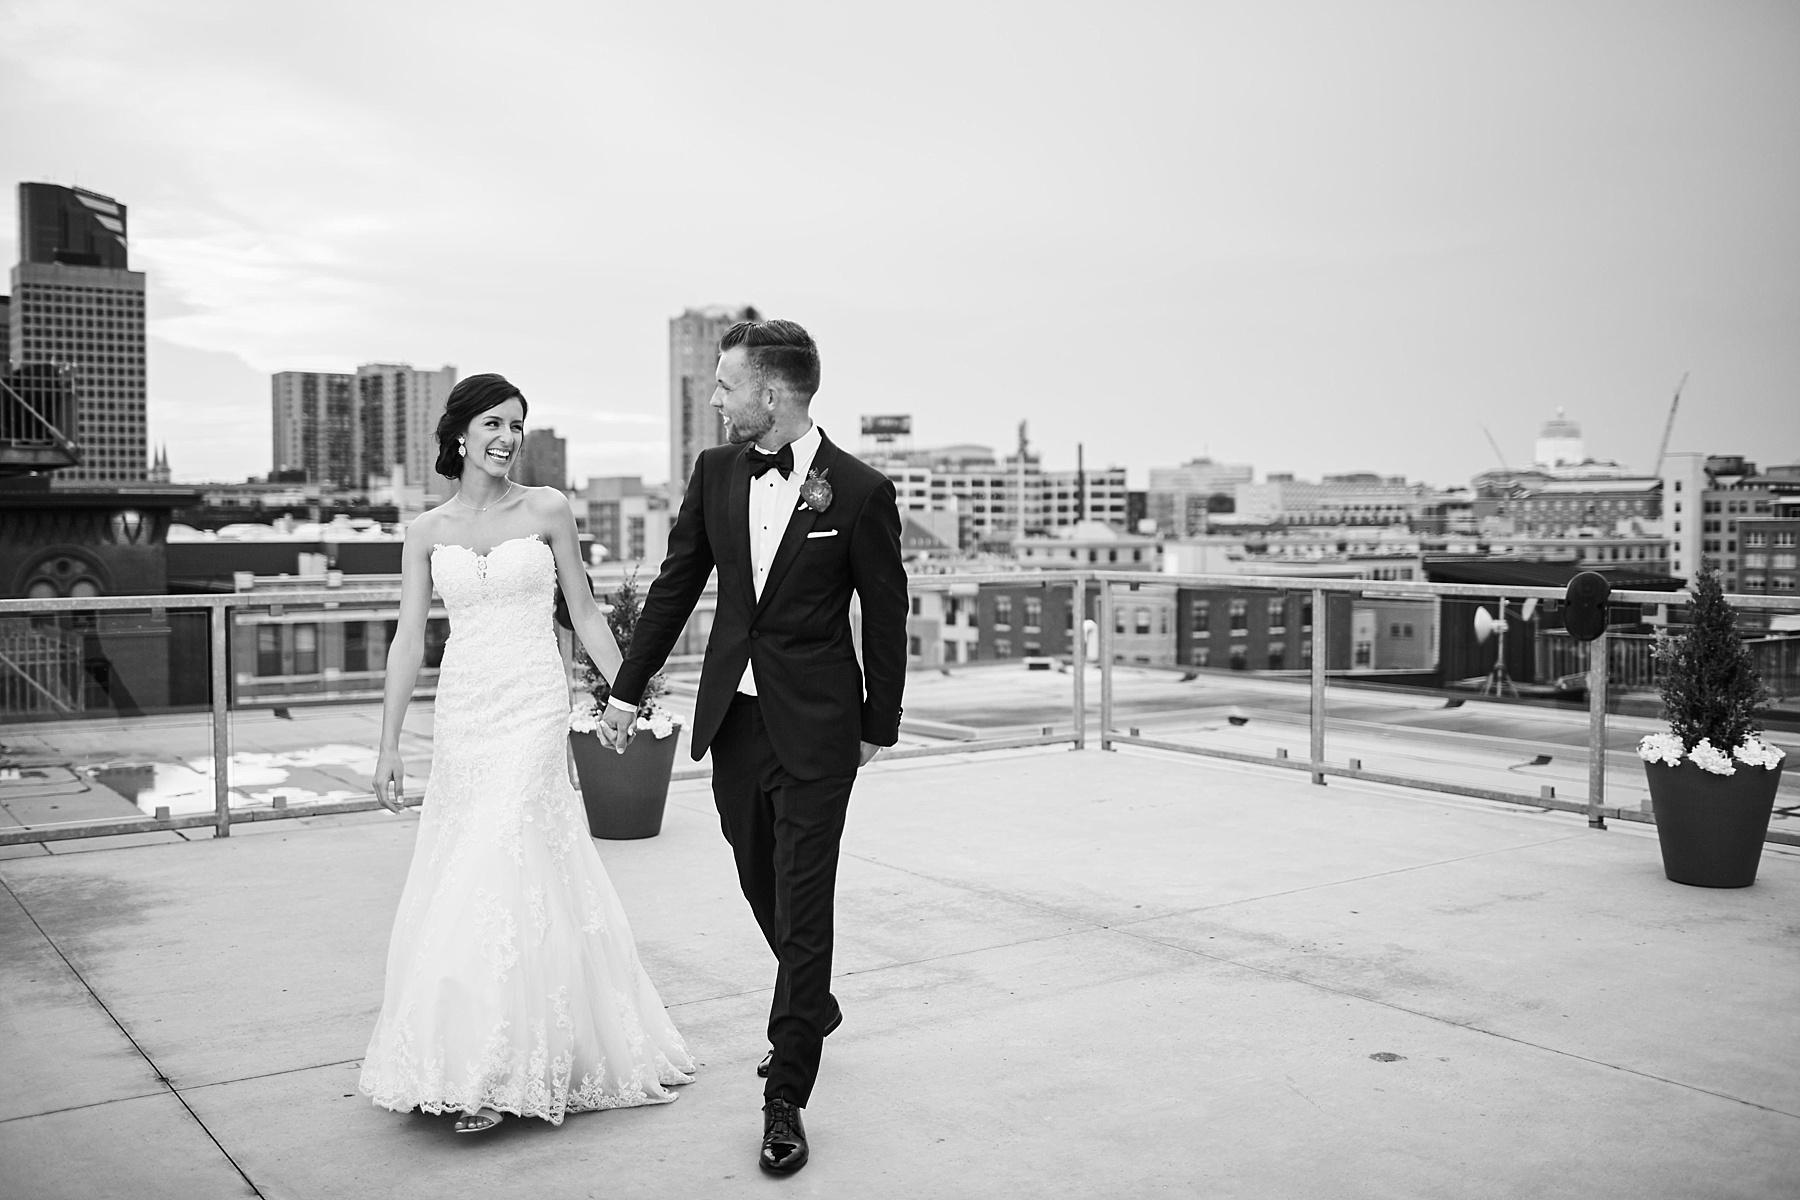 ABULAE-Wedding-Saint-paul-MN-Josh-Sofia-Wedding-Mears-Park_0822.jpg